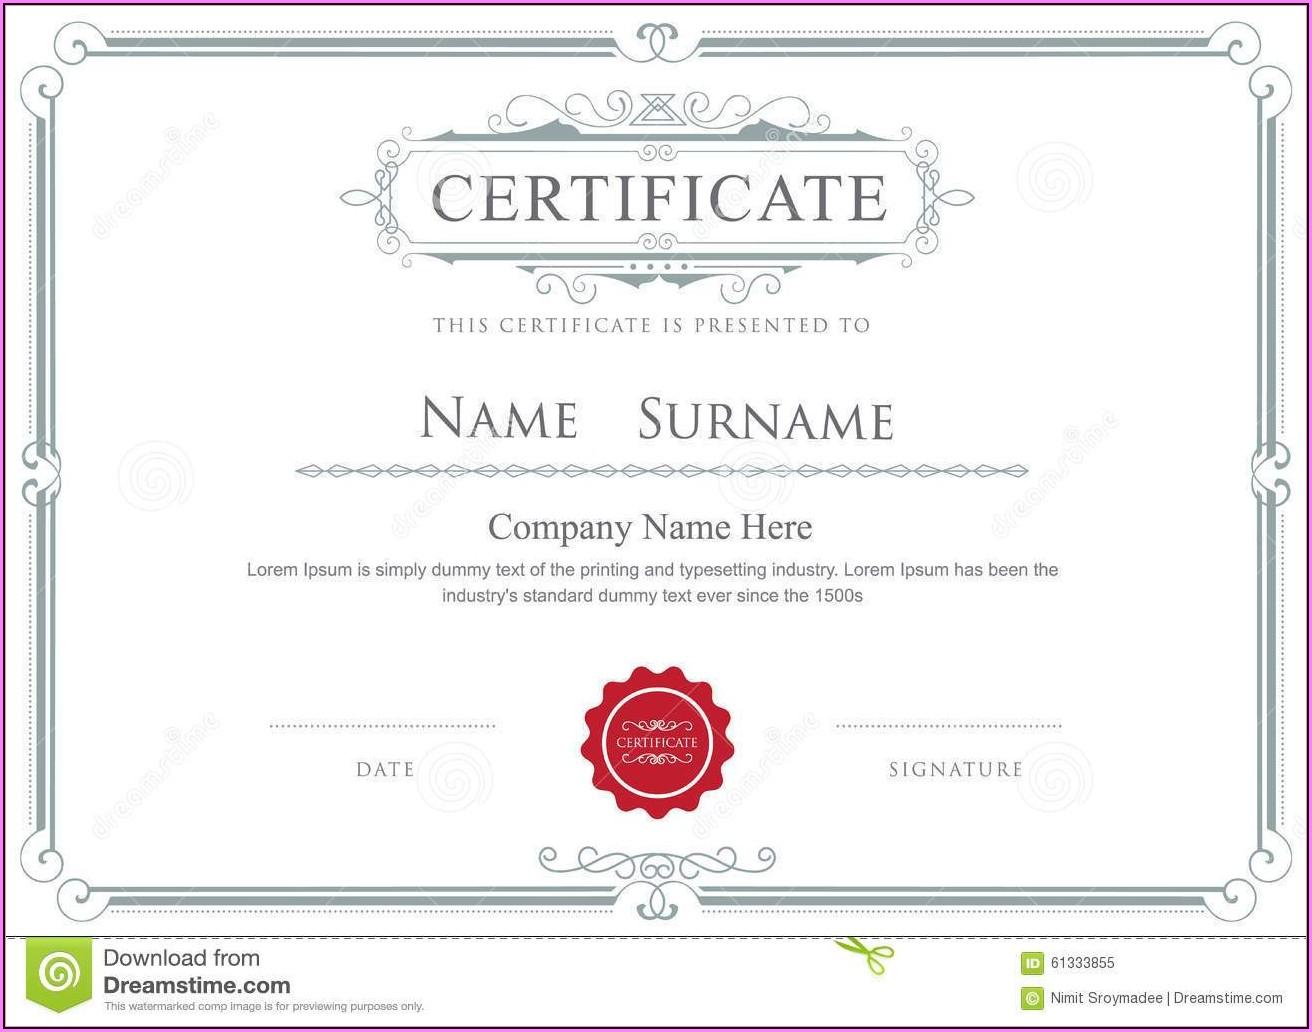 Free Stock Certificate Border Template